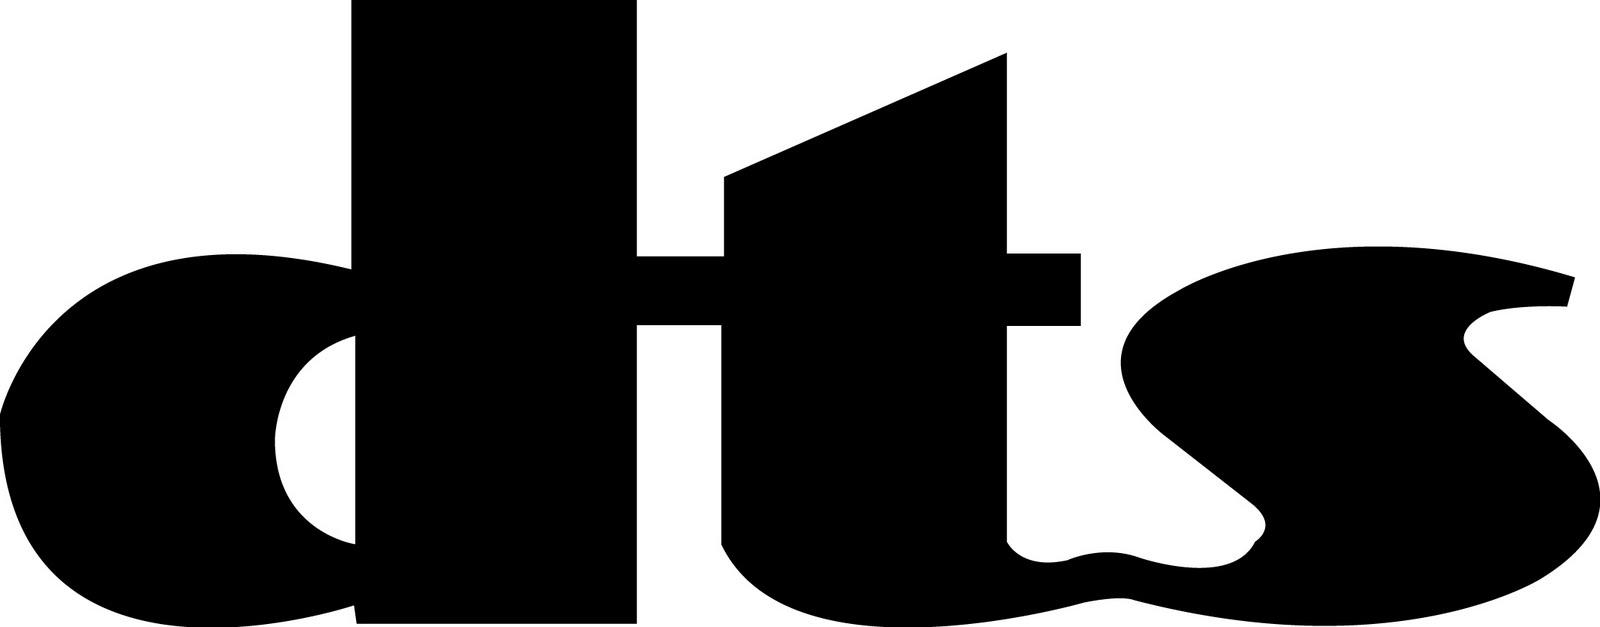 History Of All Logos All Dts Logos